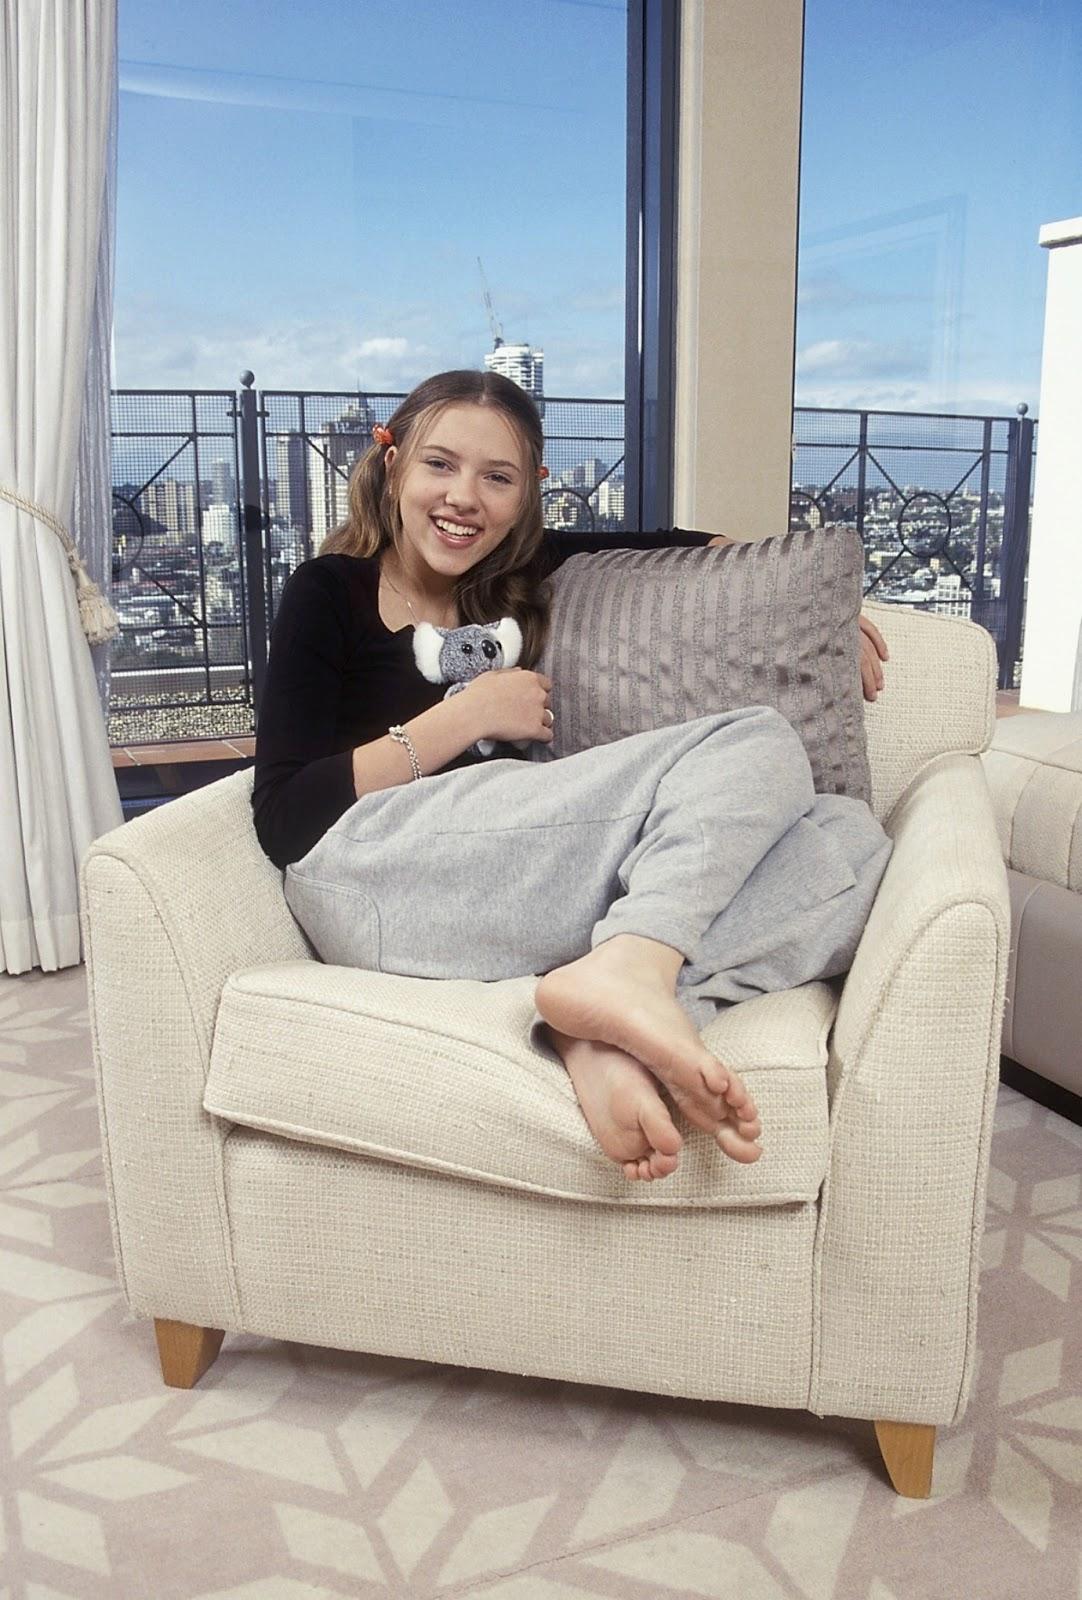 Feetxpress a dutch foot blog scarlett johansson - Scarlett johansson blogspot ...